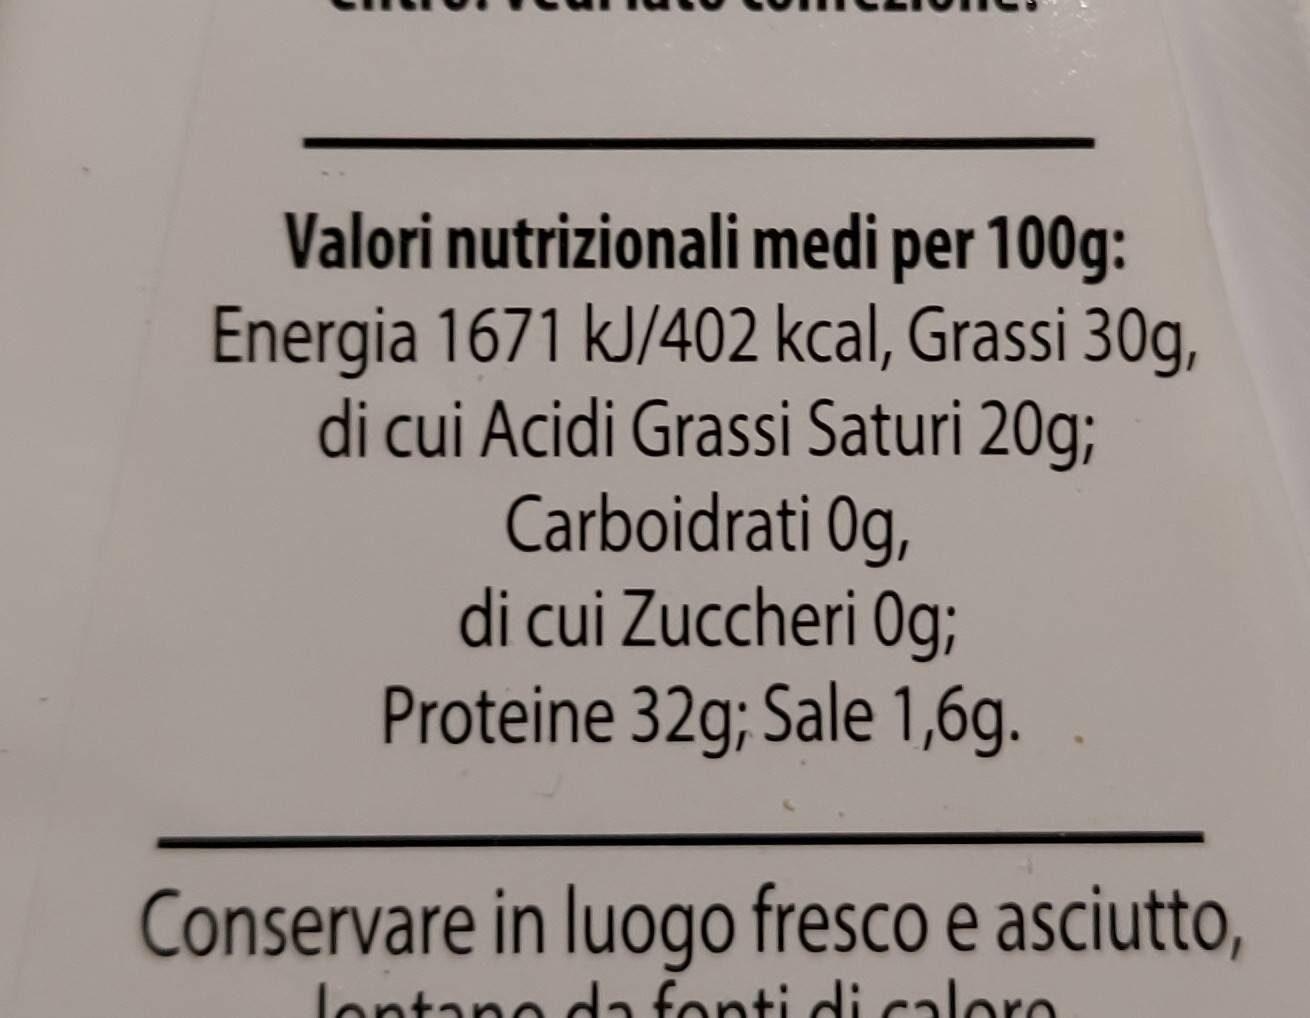 Parmigiano Reggiano - Valori nutrizionali - it